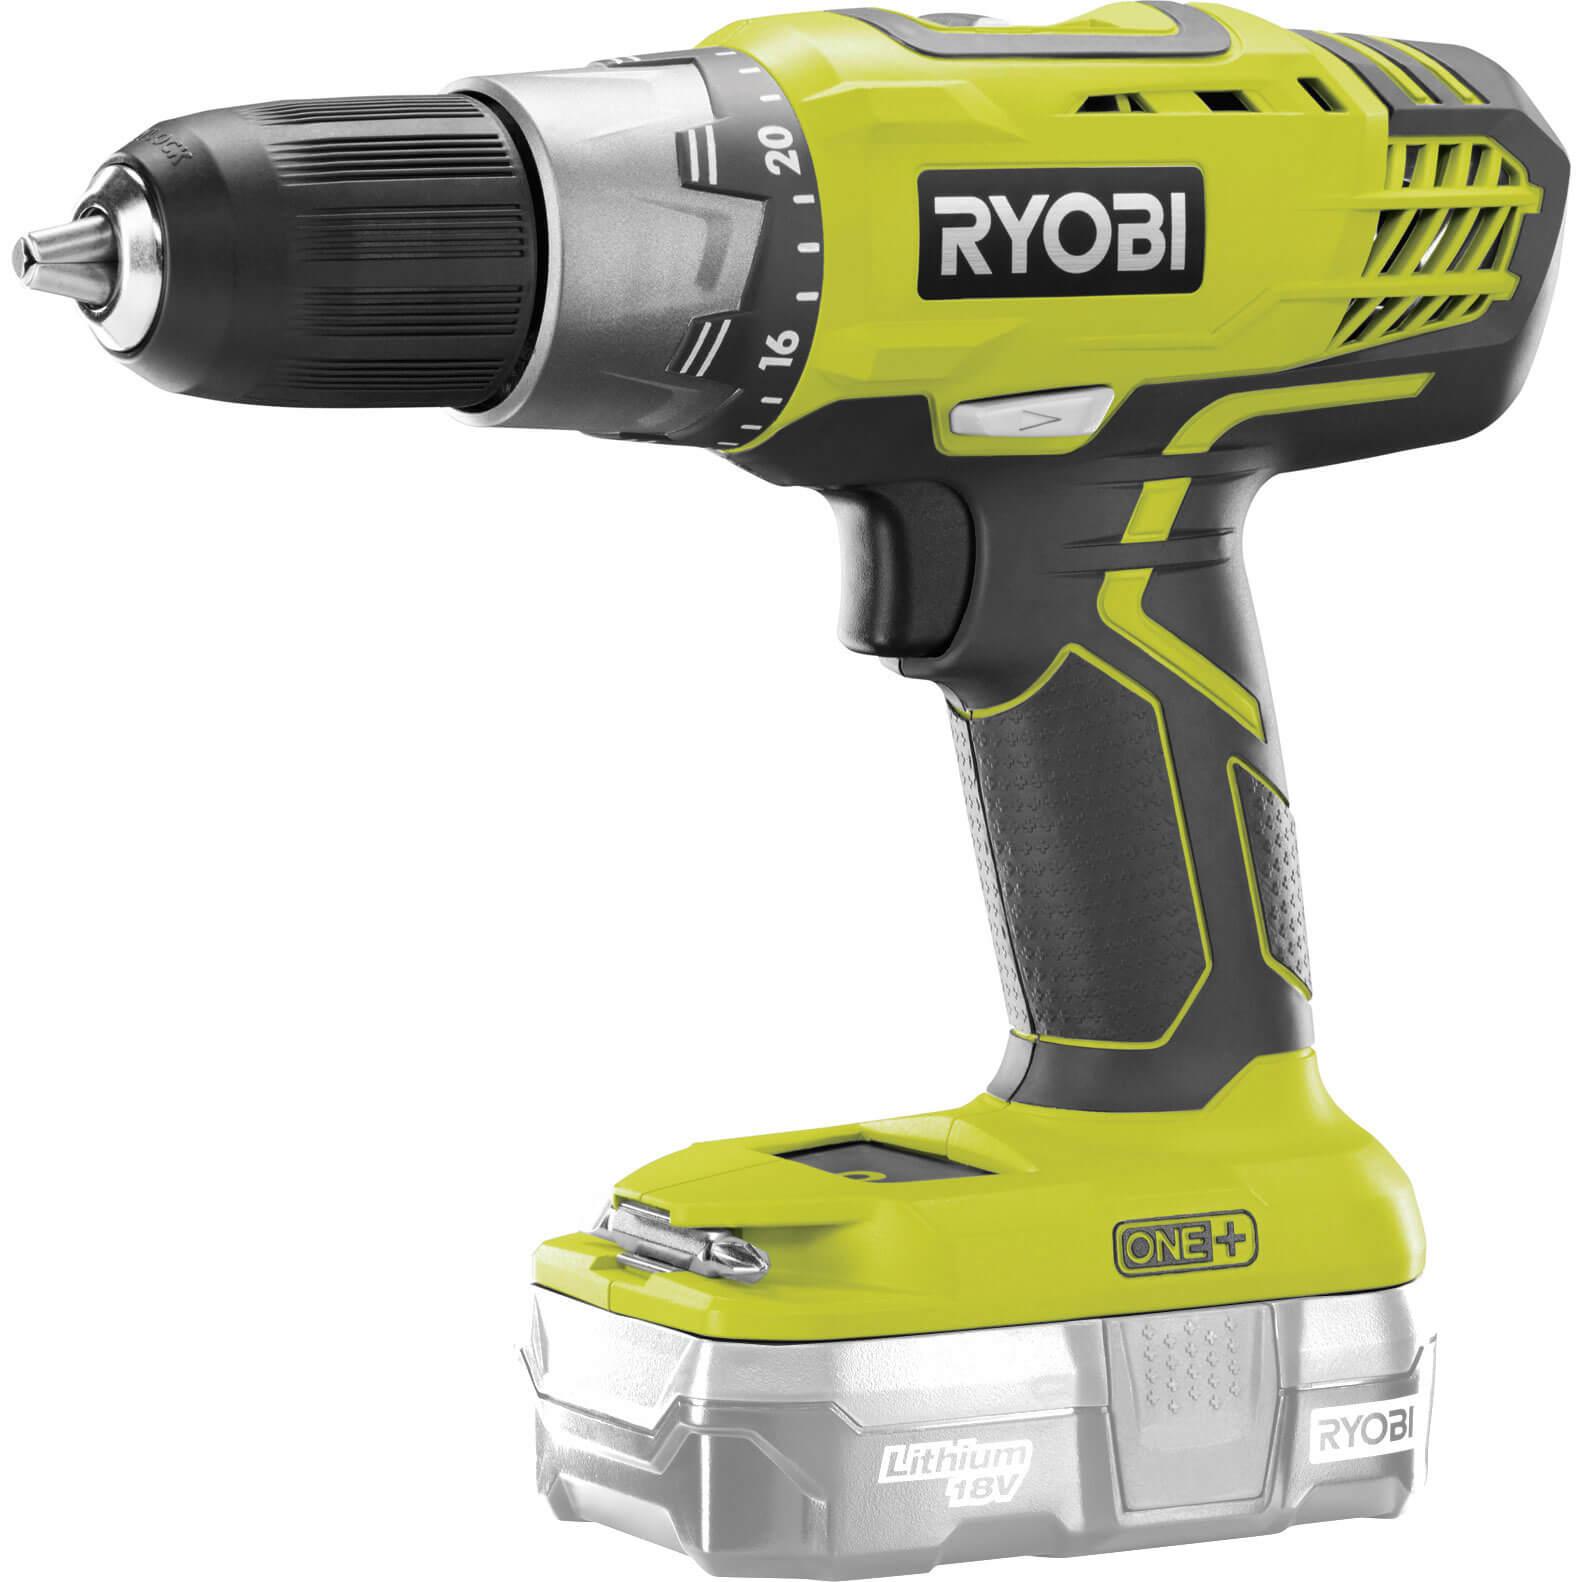 ryobi r18ddp2 one 18v cordless drill driver rh tooled up com ryobi 18v drill instructions ryobi cordless drill manual